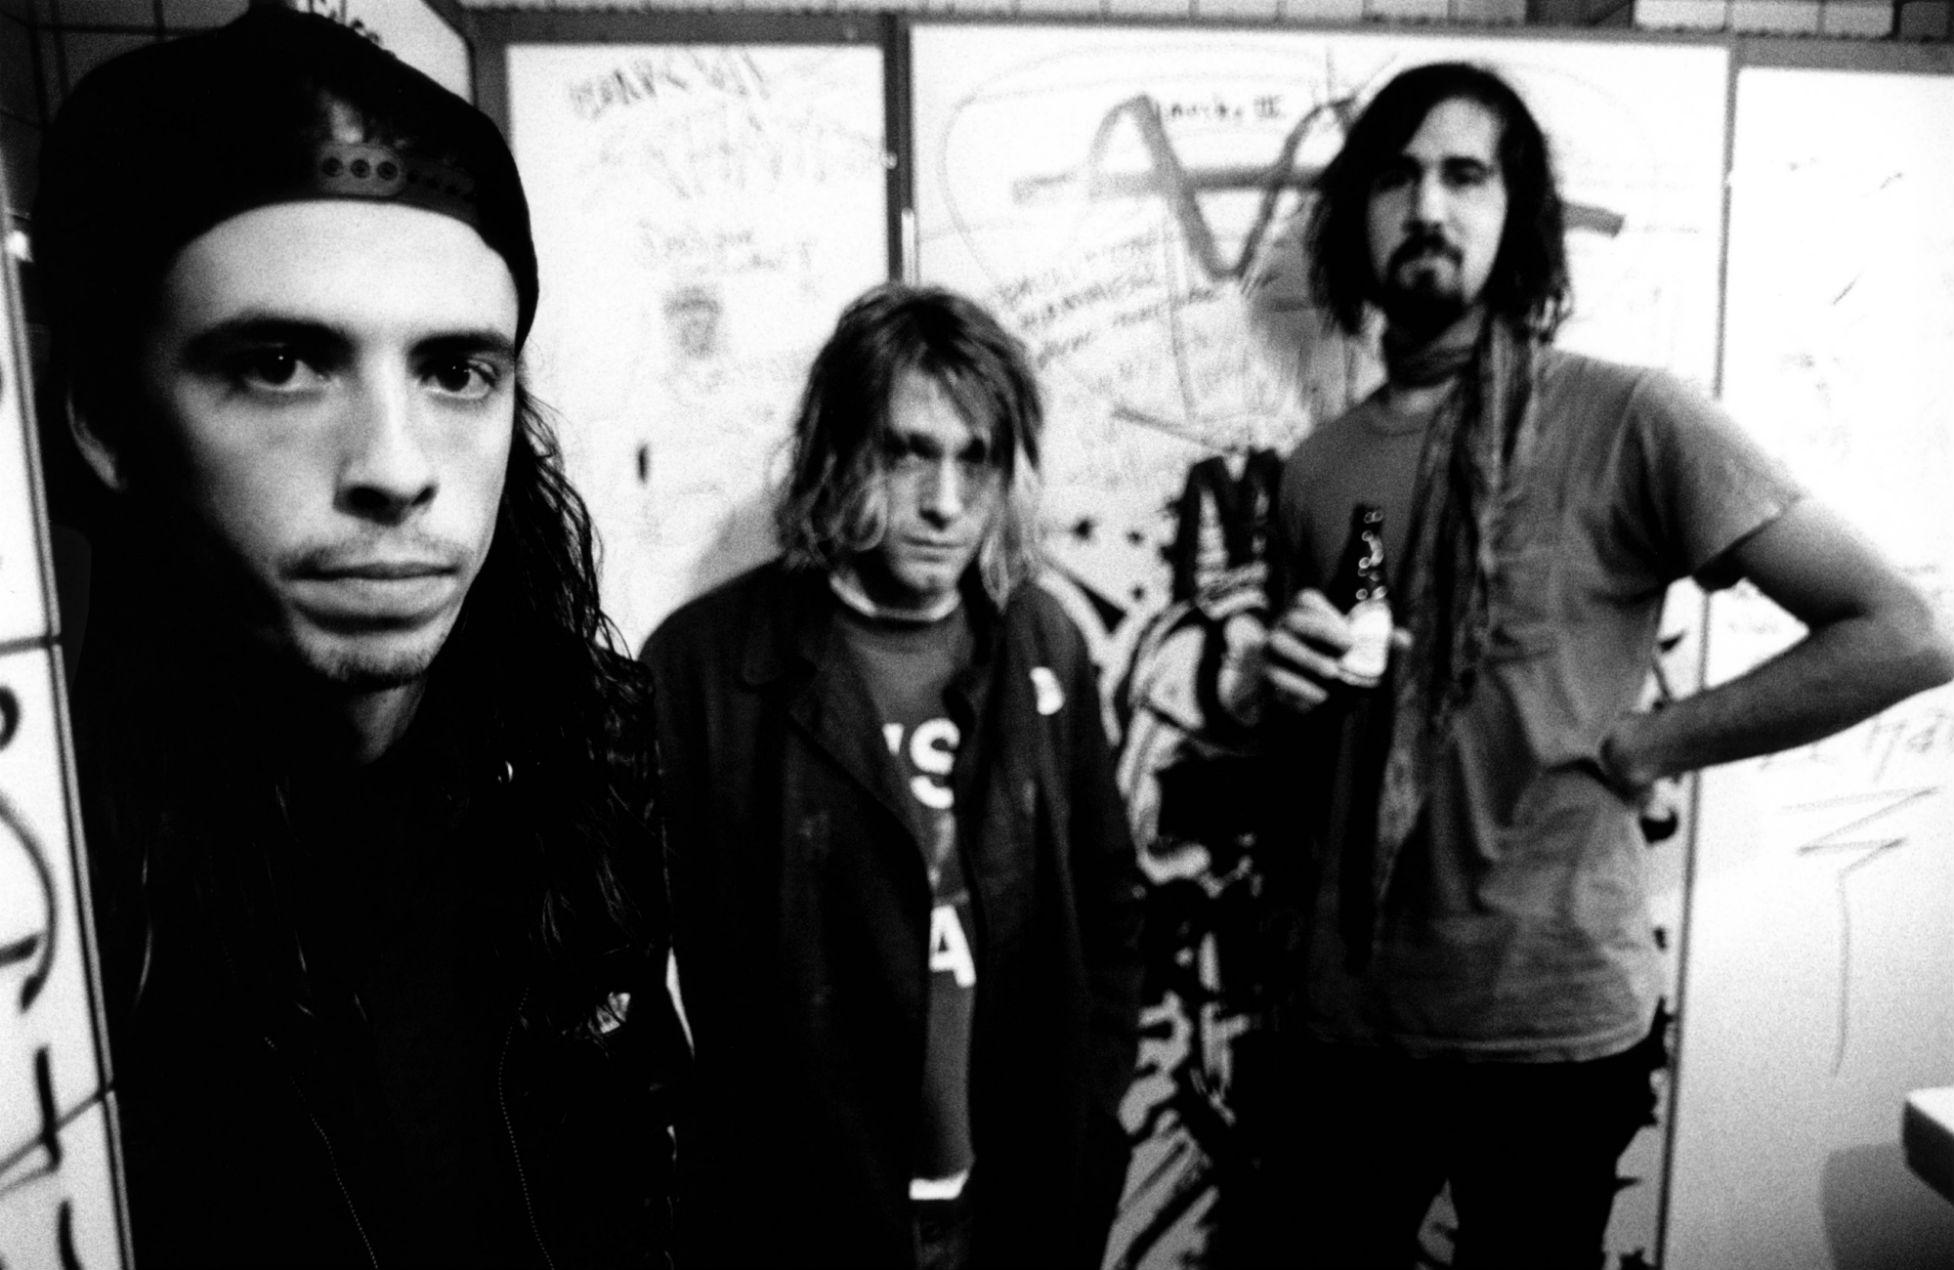 Dave Grohl; Nirvana; Kurt Cobain